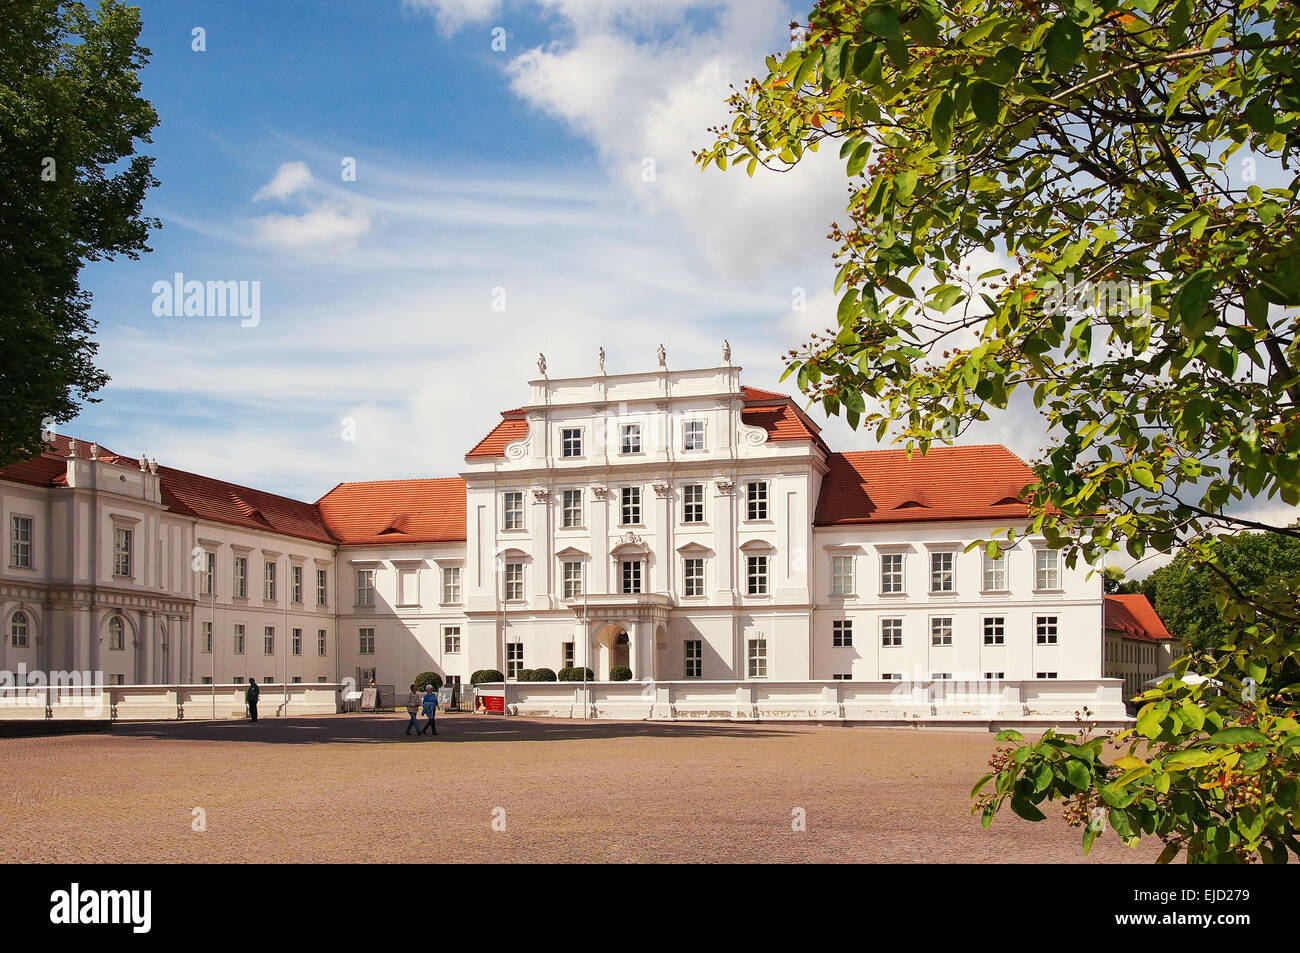 Castle Oranienburg Brandenburg Germany - Stock Image